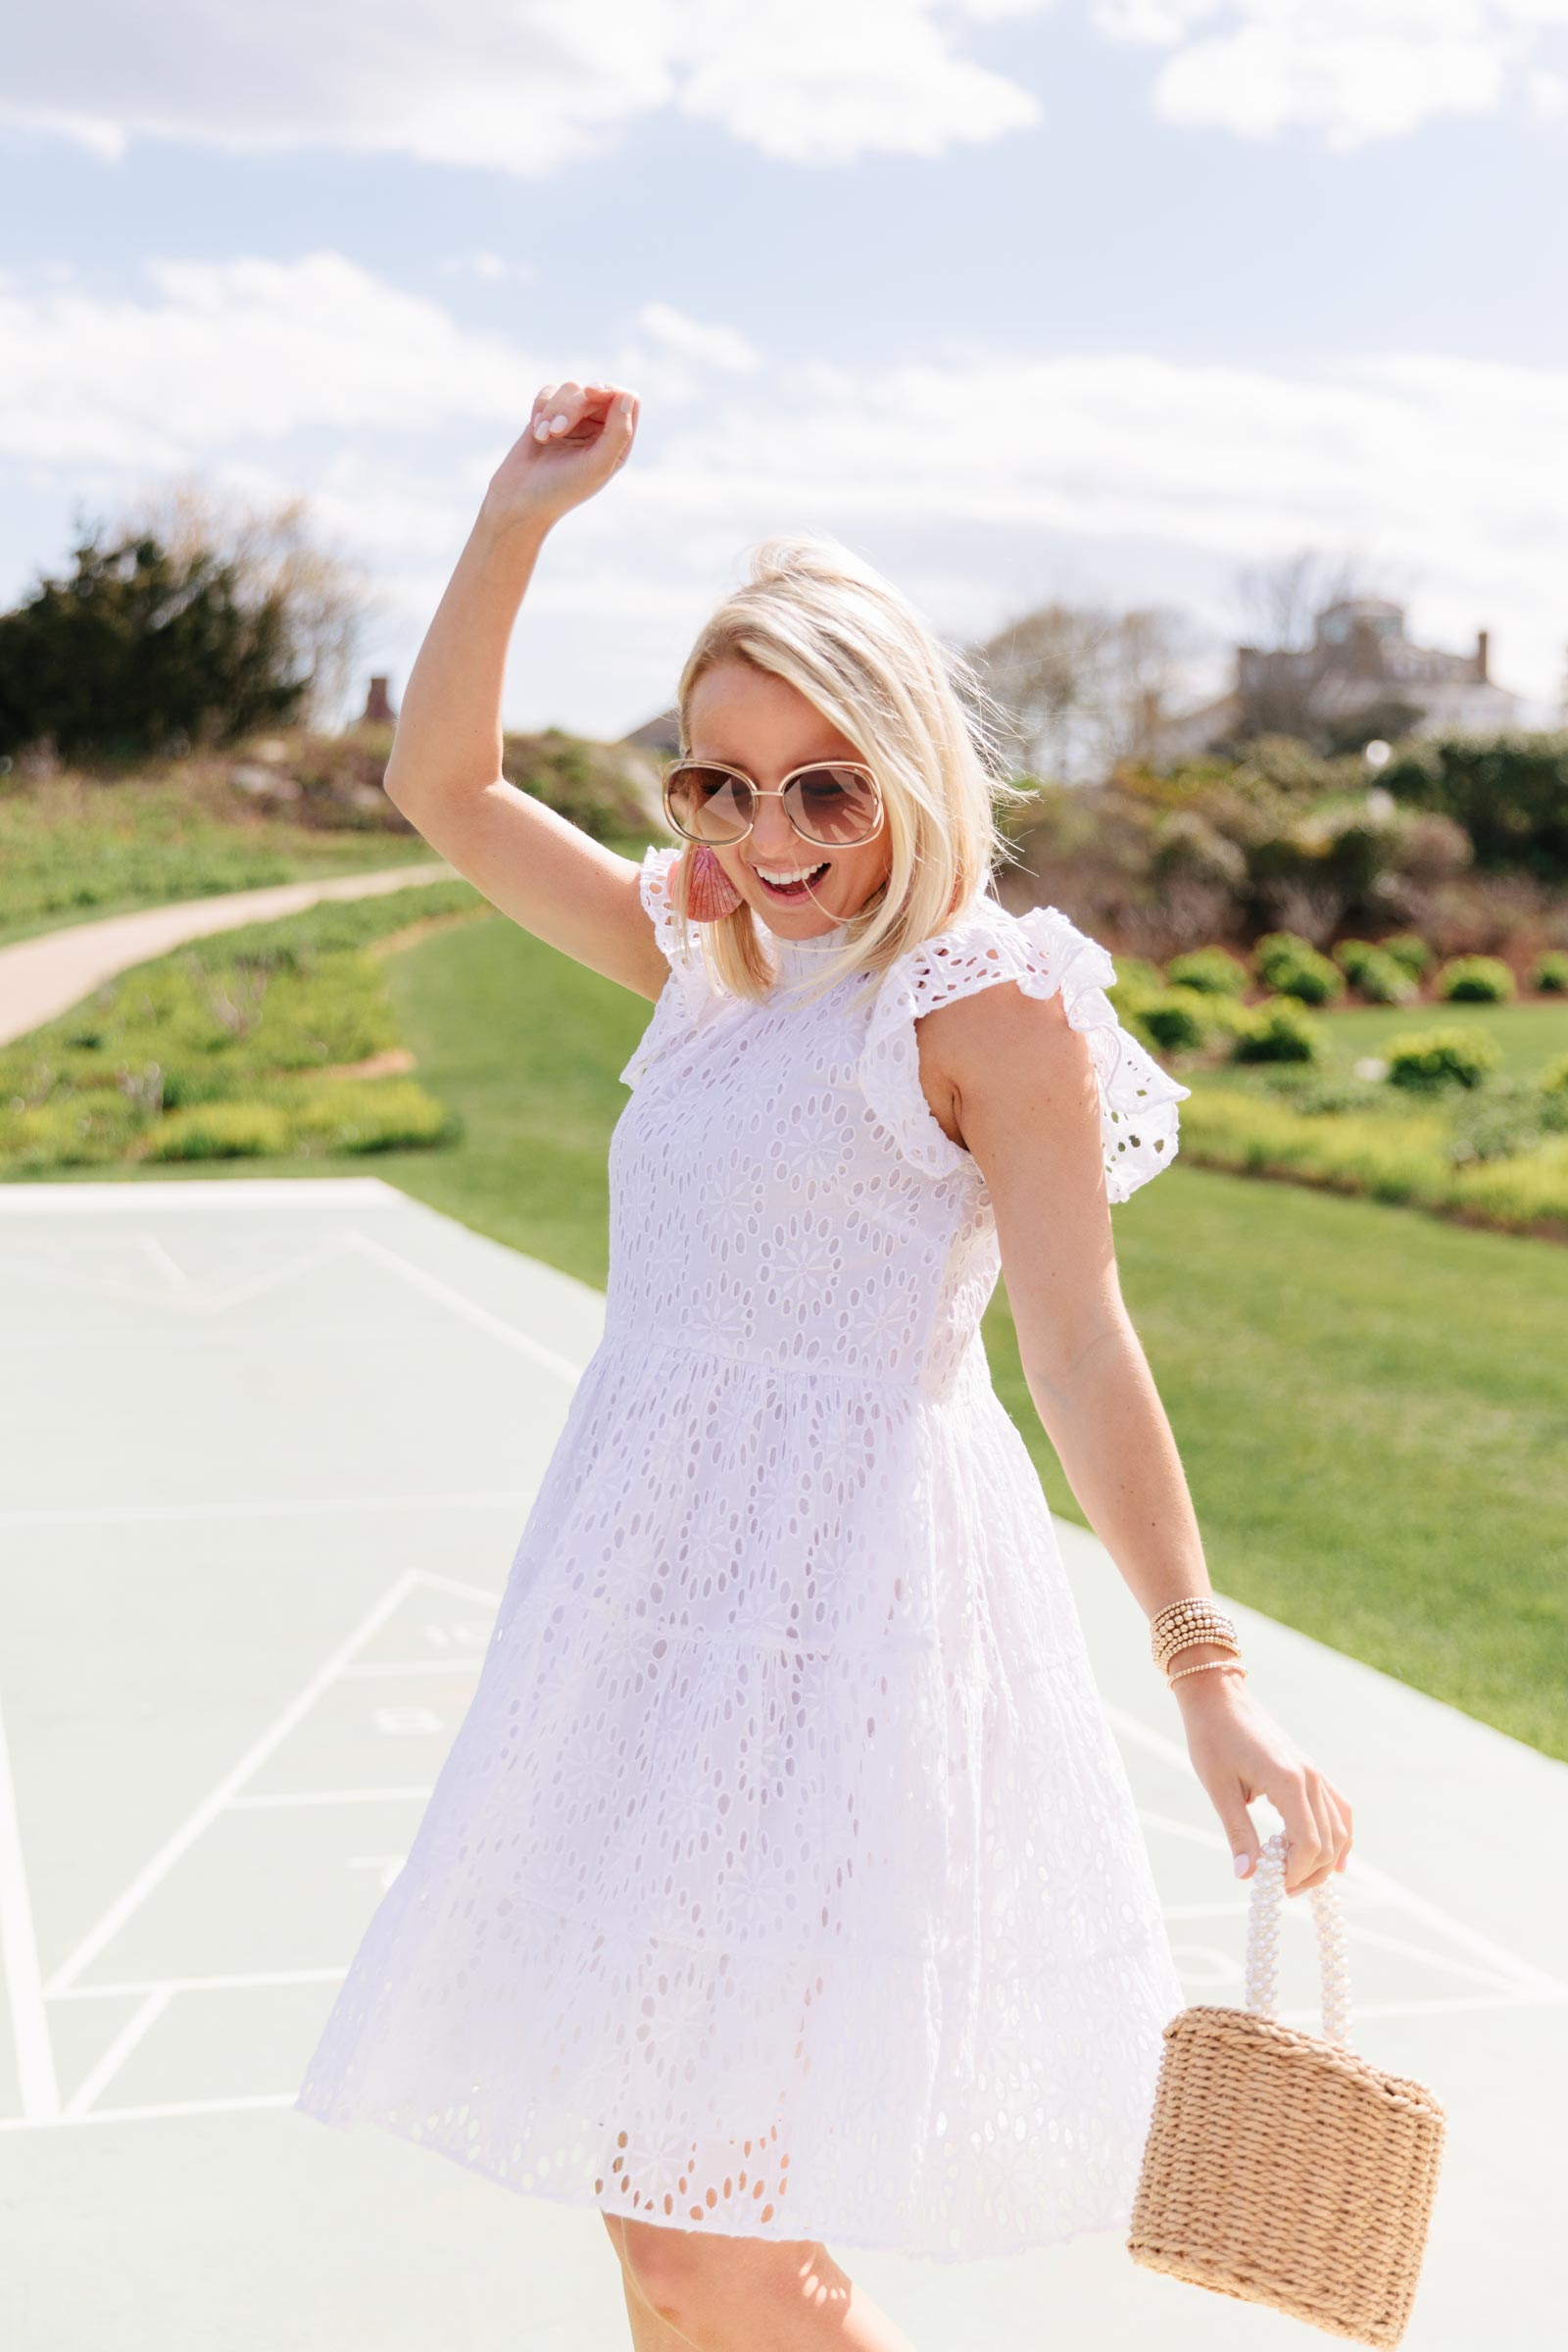 Amy Littleson White Eyelet Dress